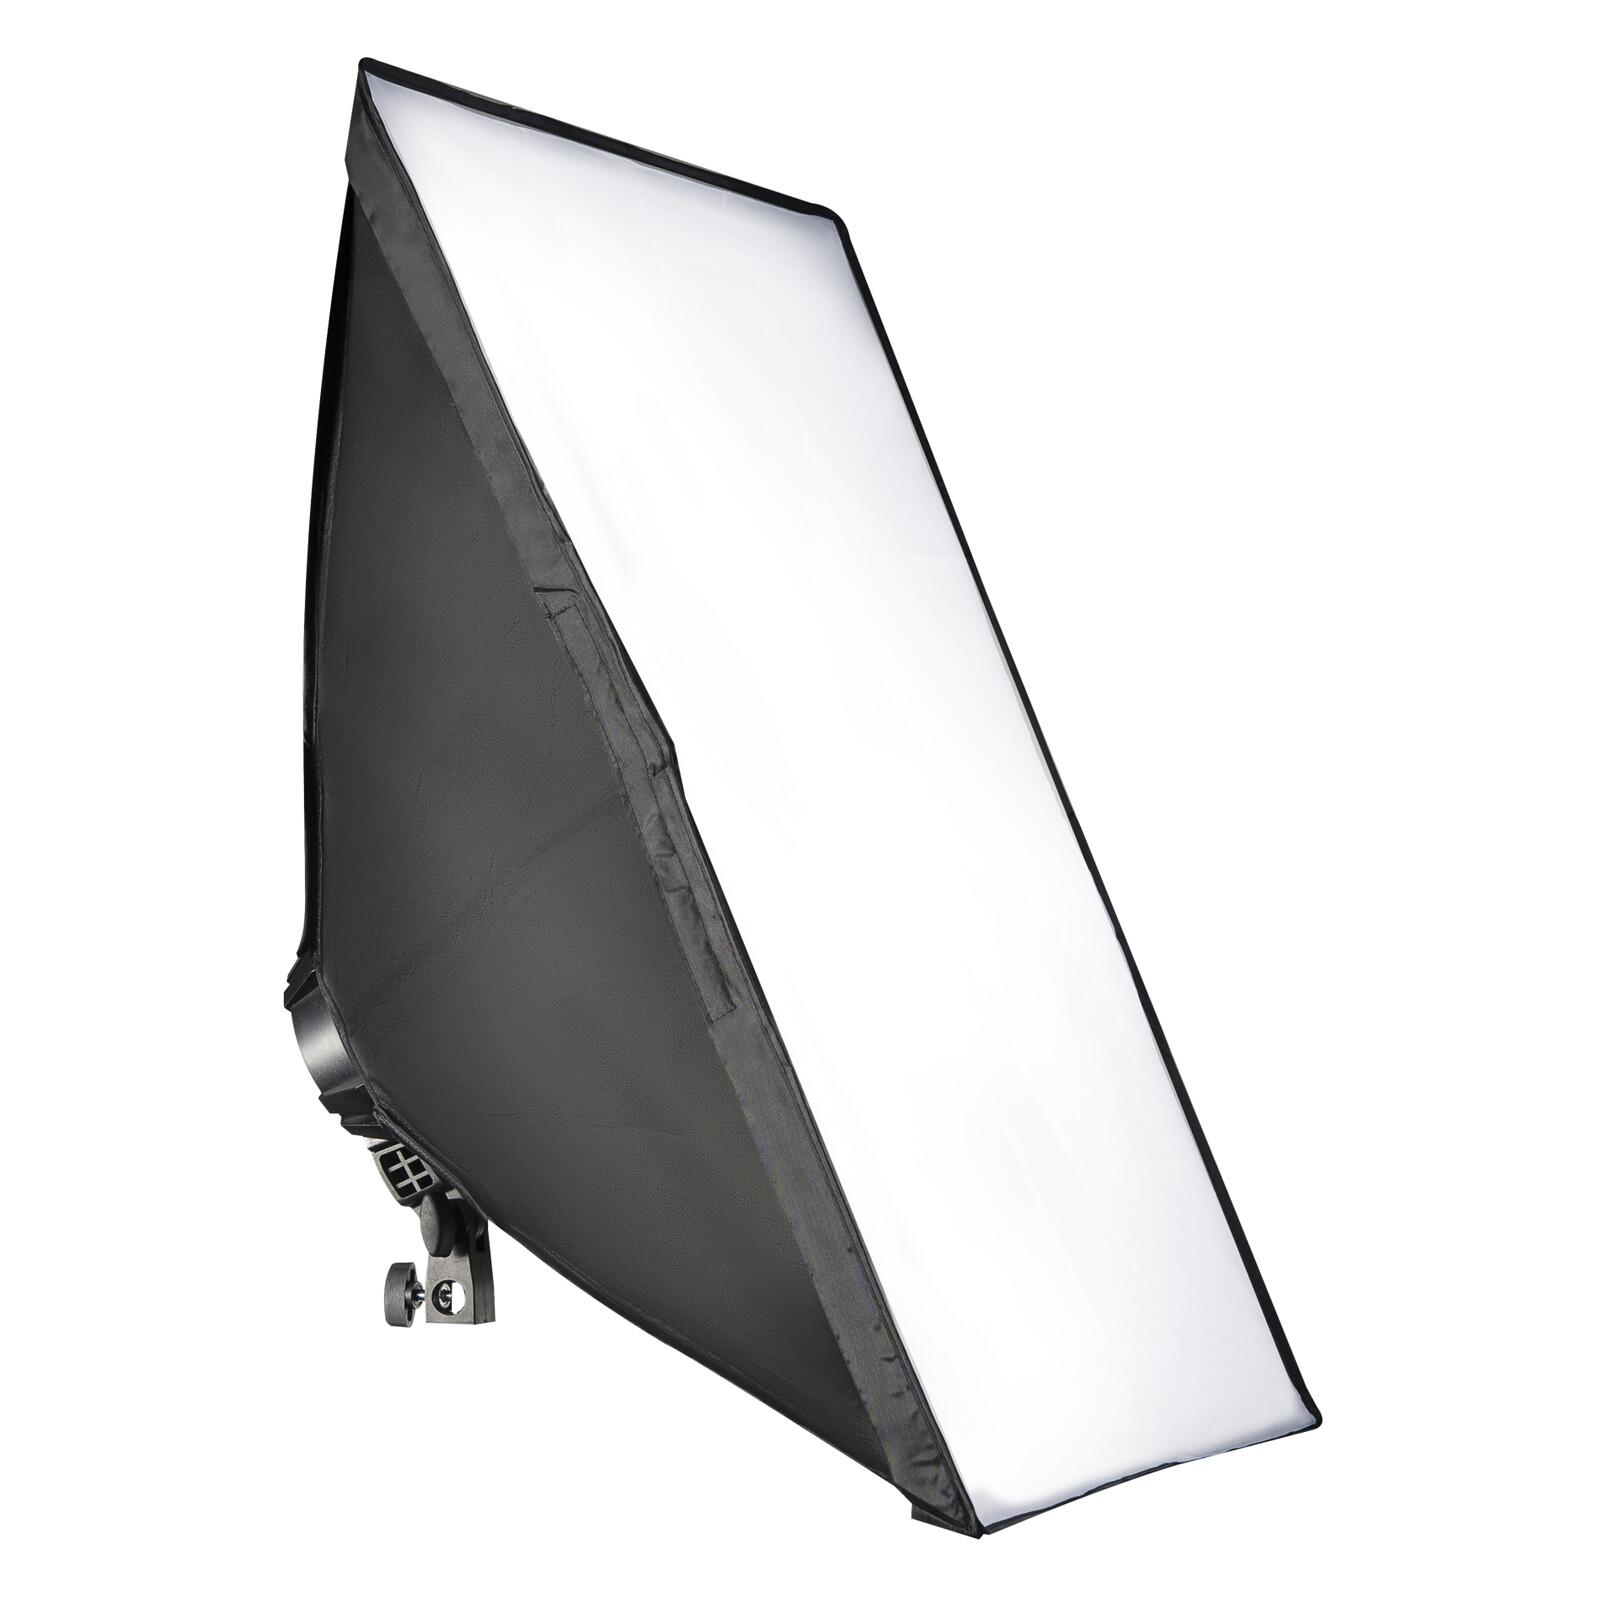 walimex Daylight 1000 mit Softbox, 50x70cm